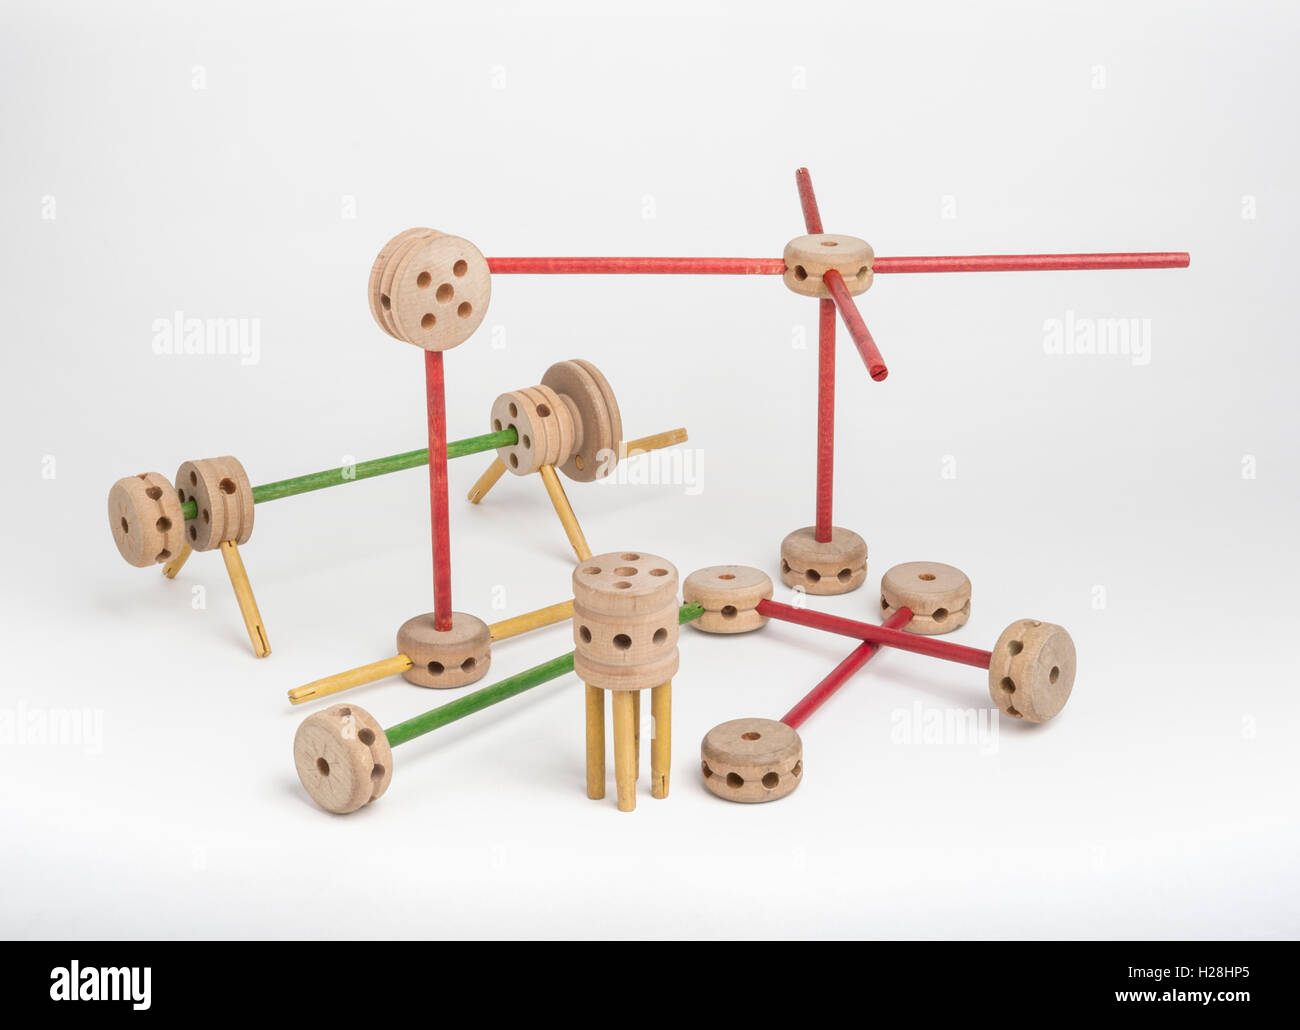 Tinker toys sur fond blanc Photo Stock